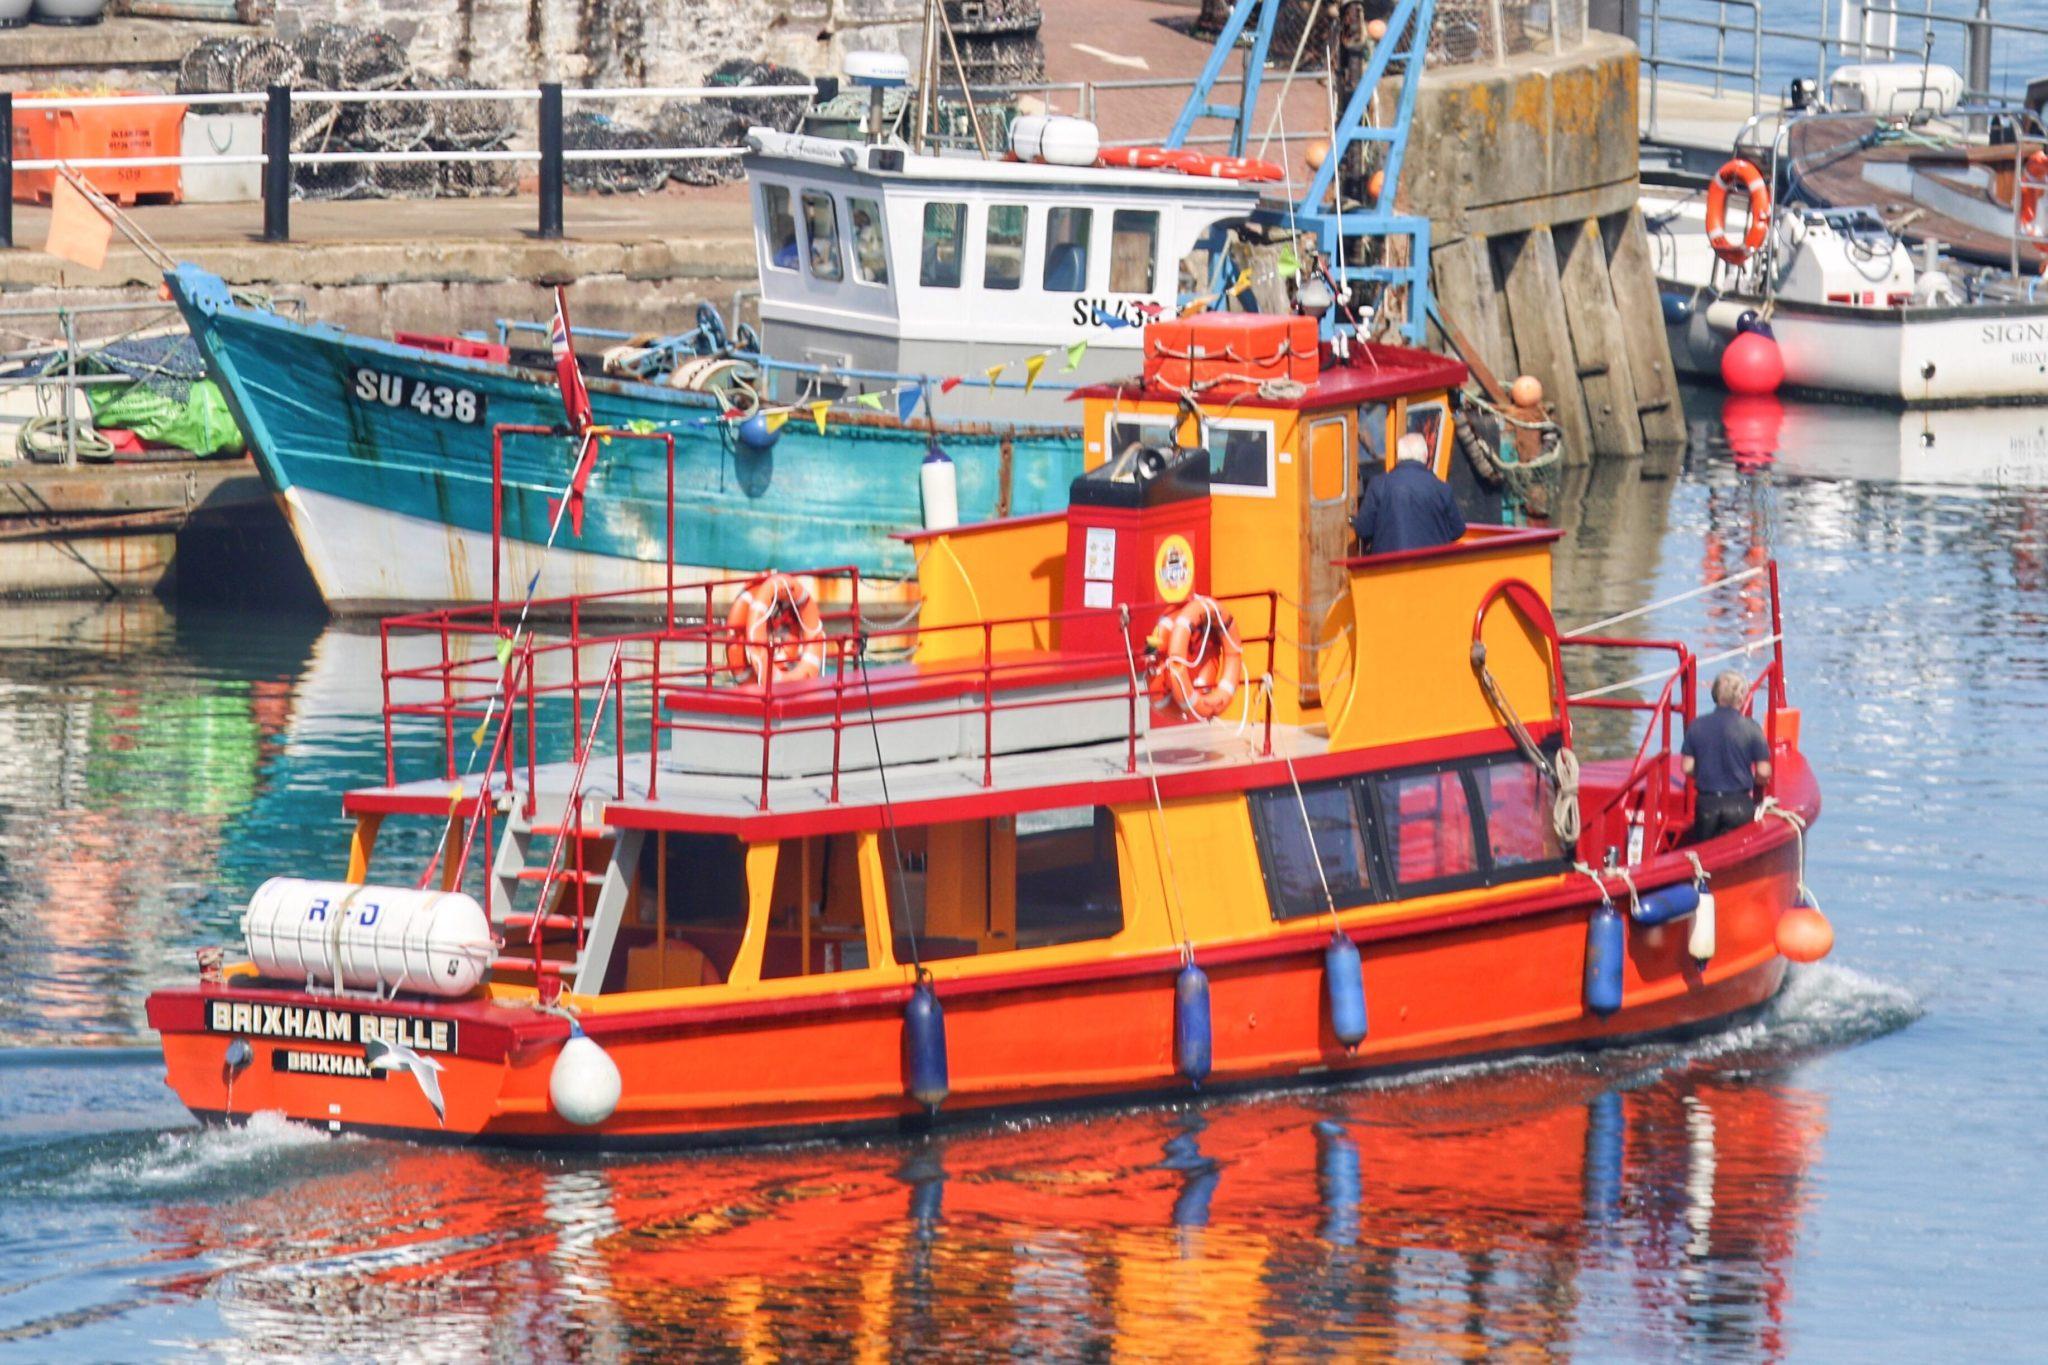 Historic Ship Brixham Belle in Brixham